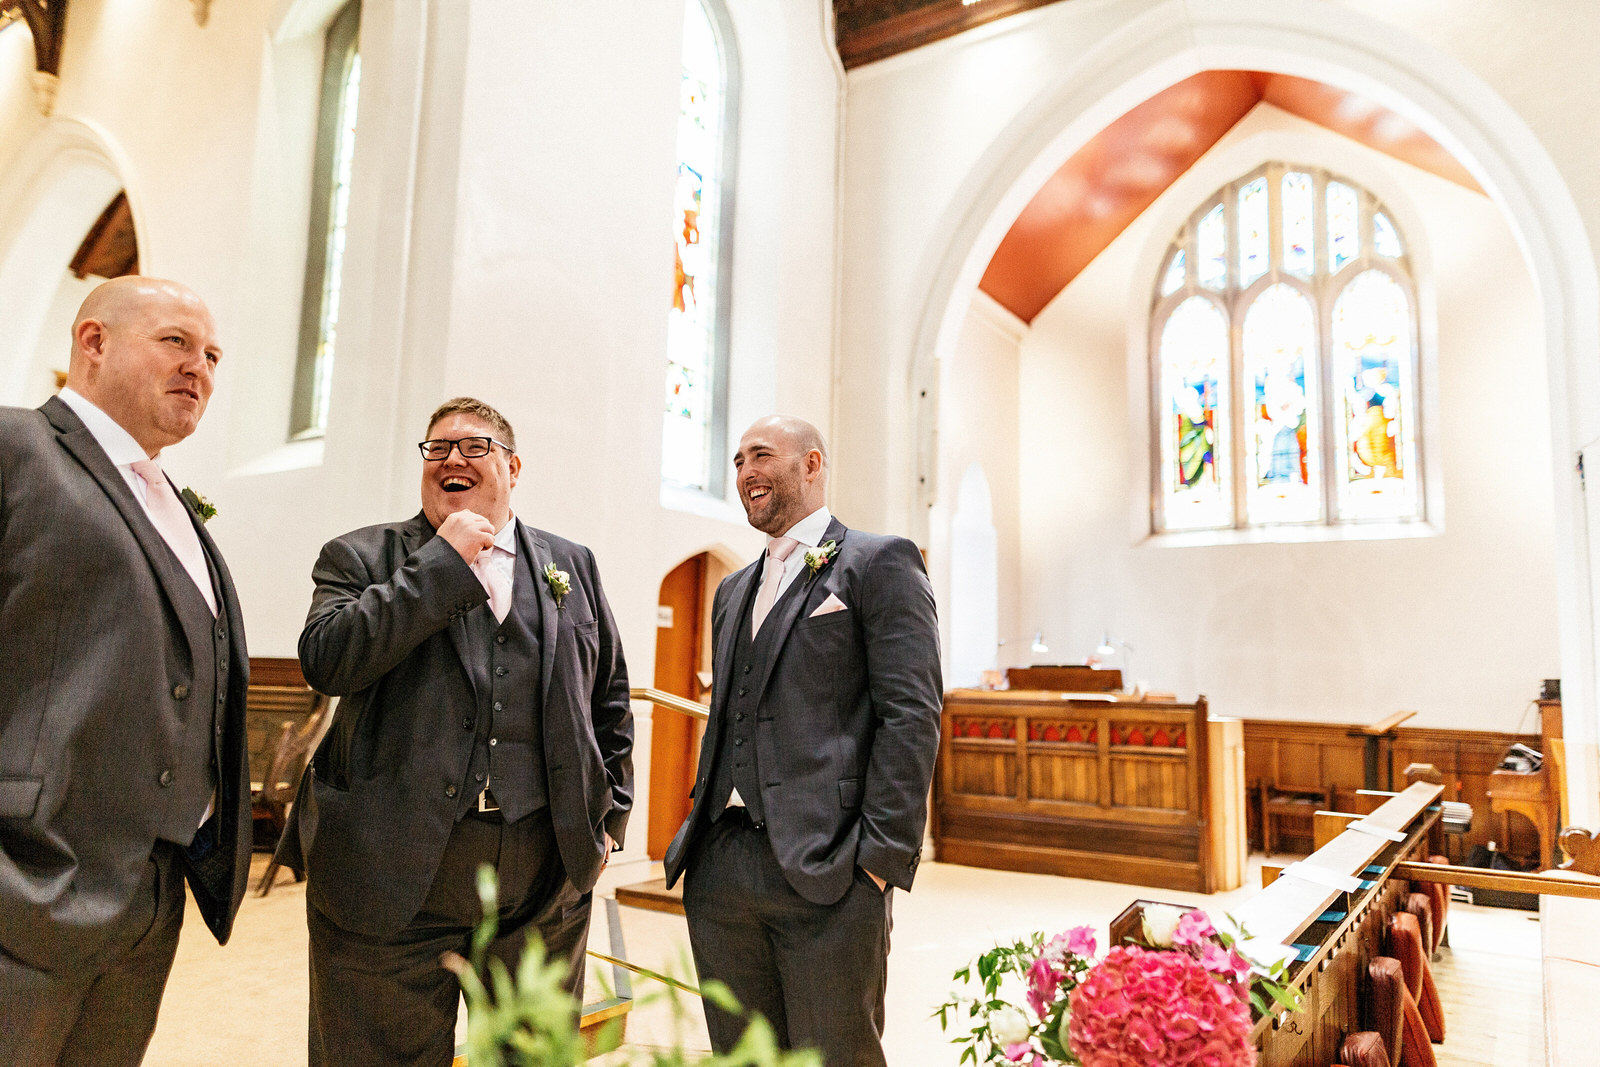 Beamish-Hall-Wedding-Photographer-010.jpg